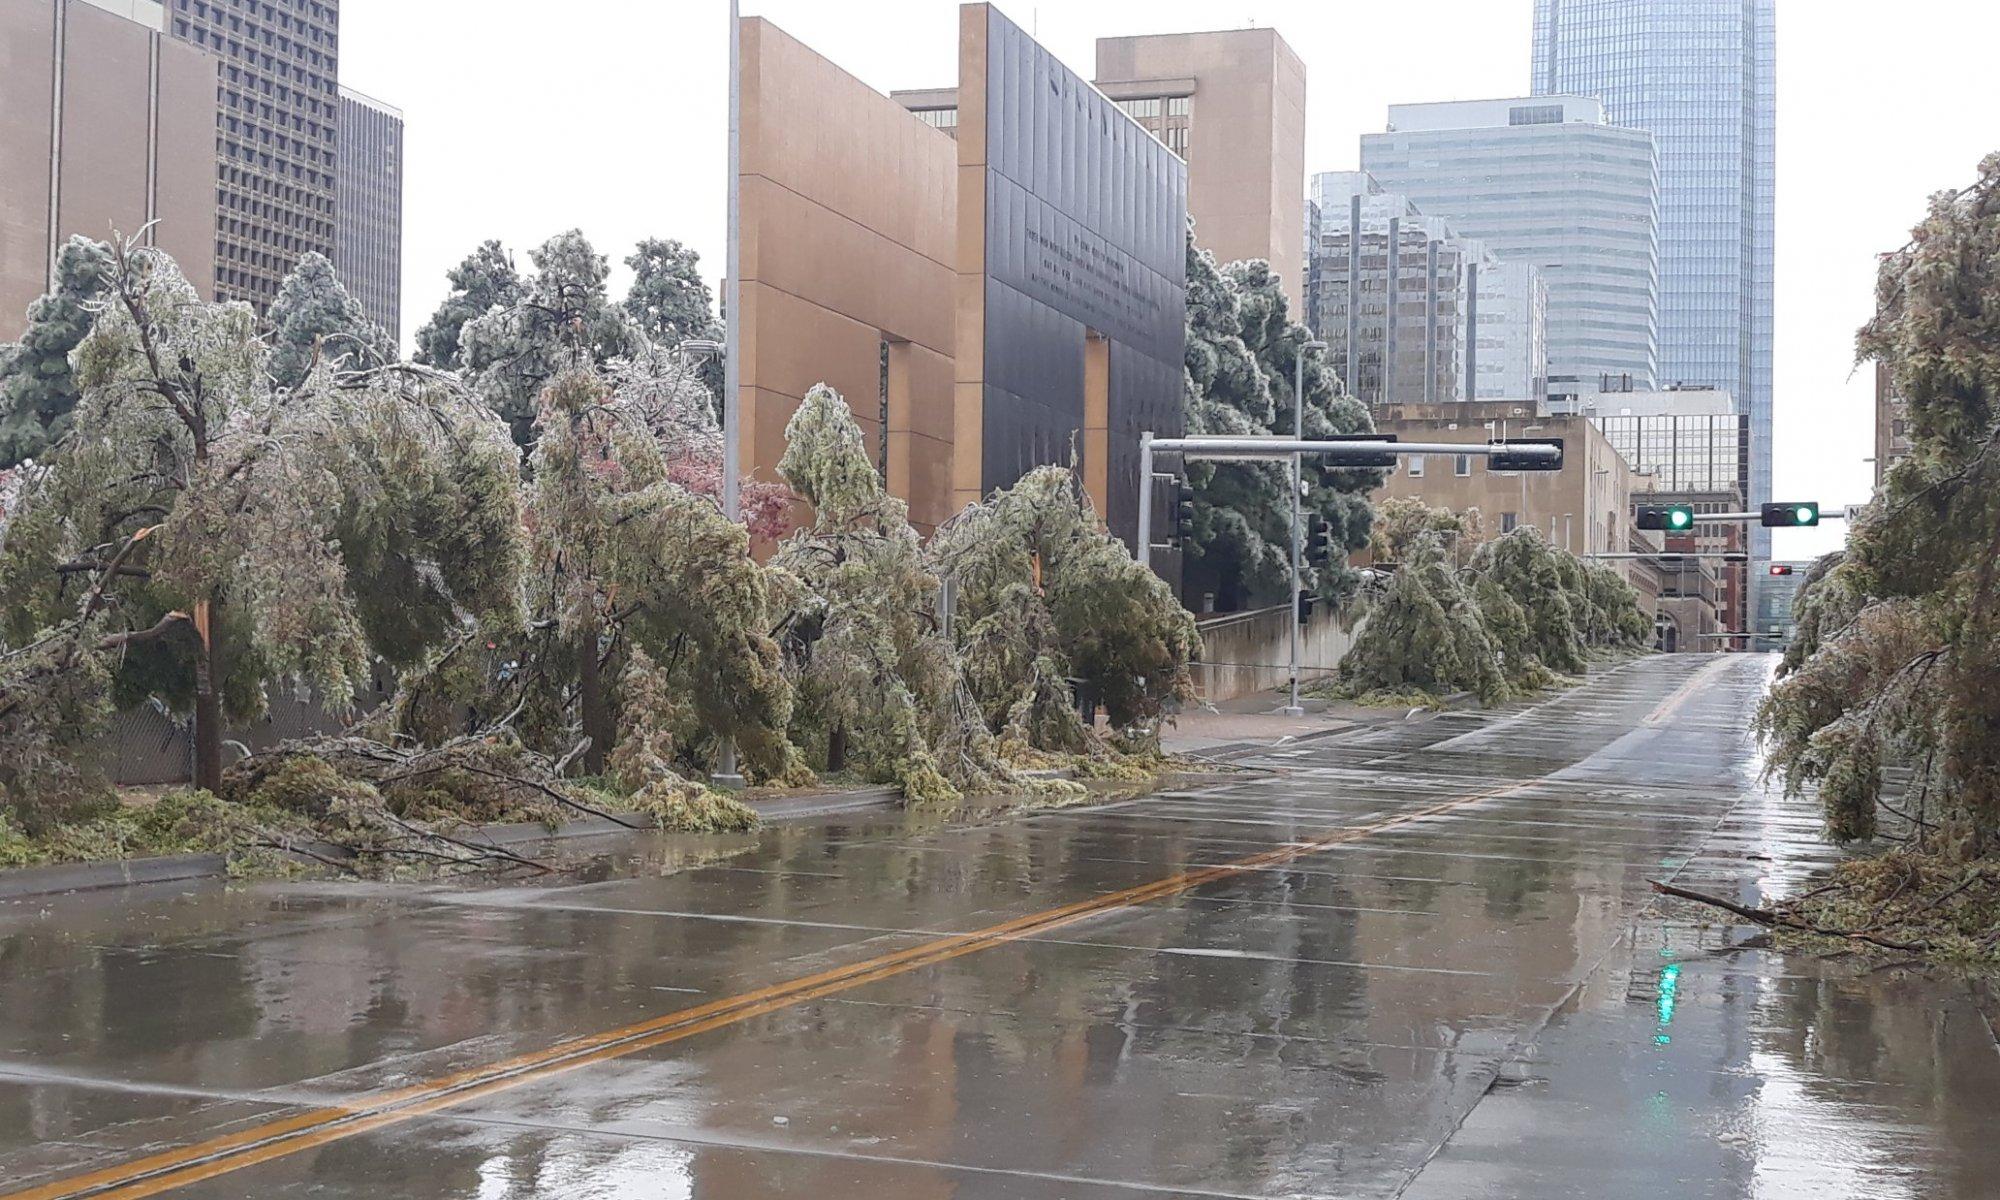 Eisregen in Oklahoma City - Quelle: Tina Pinkerton - twitter https://twitter.com/TinaPinkerton6/status/1321132554875998209/photo/1